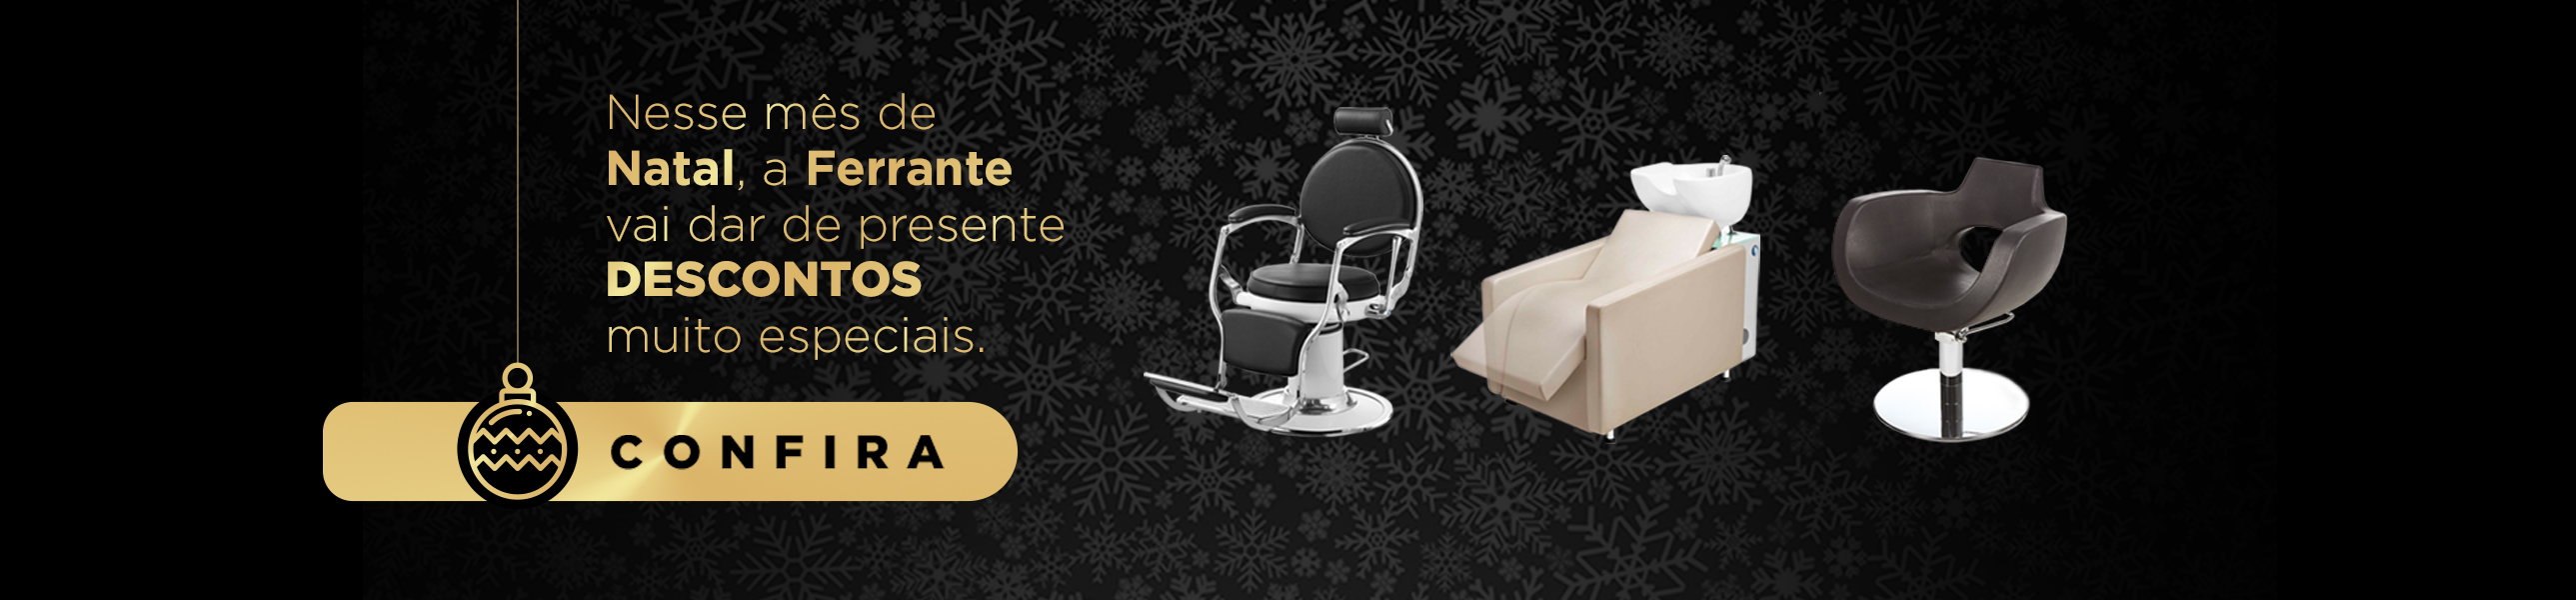 Ferrante-Site-Promocao-Natal-Home